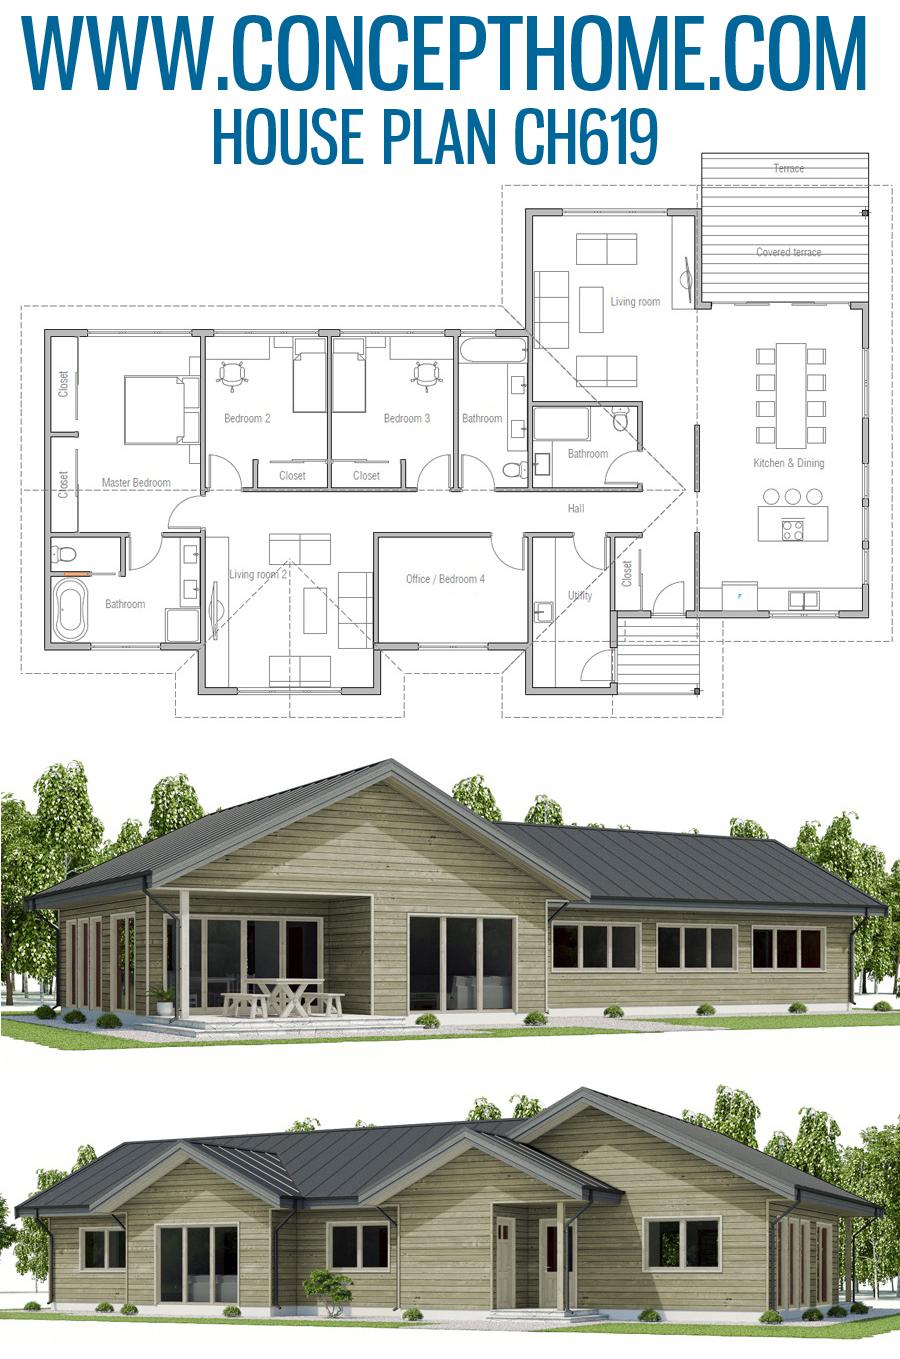 Floor Plan Ch619 House Plans Dream House Plans Floor Plans